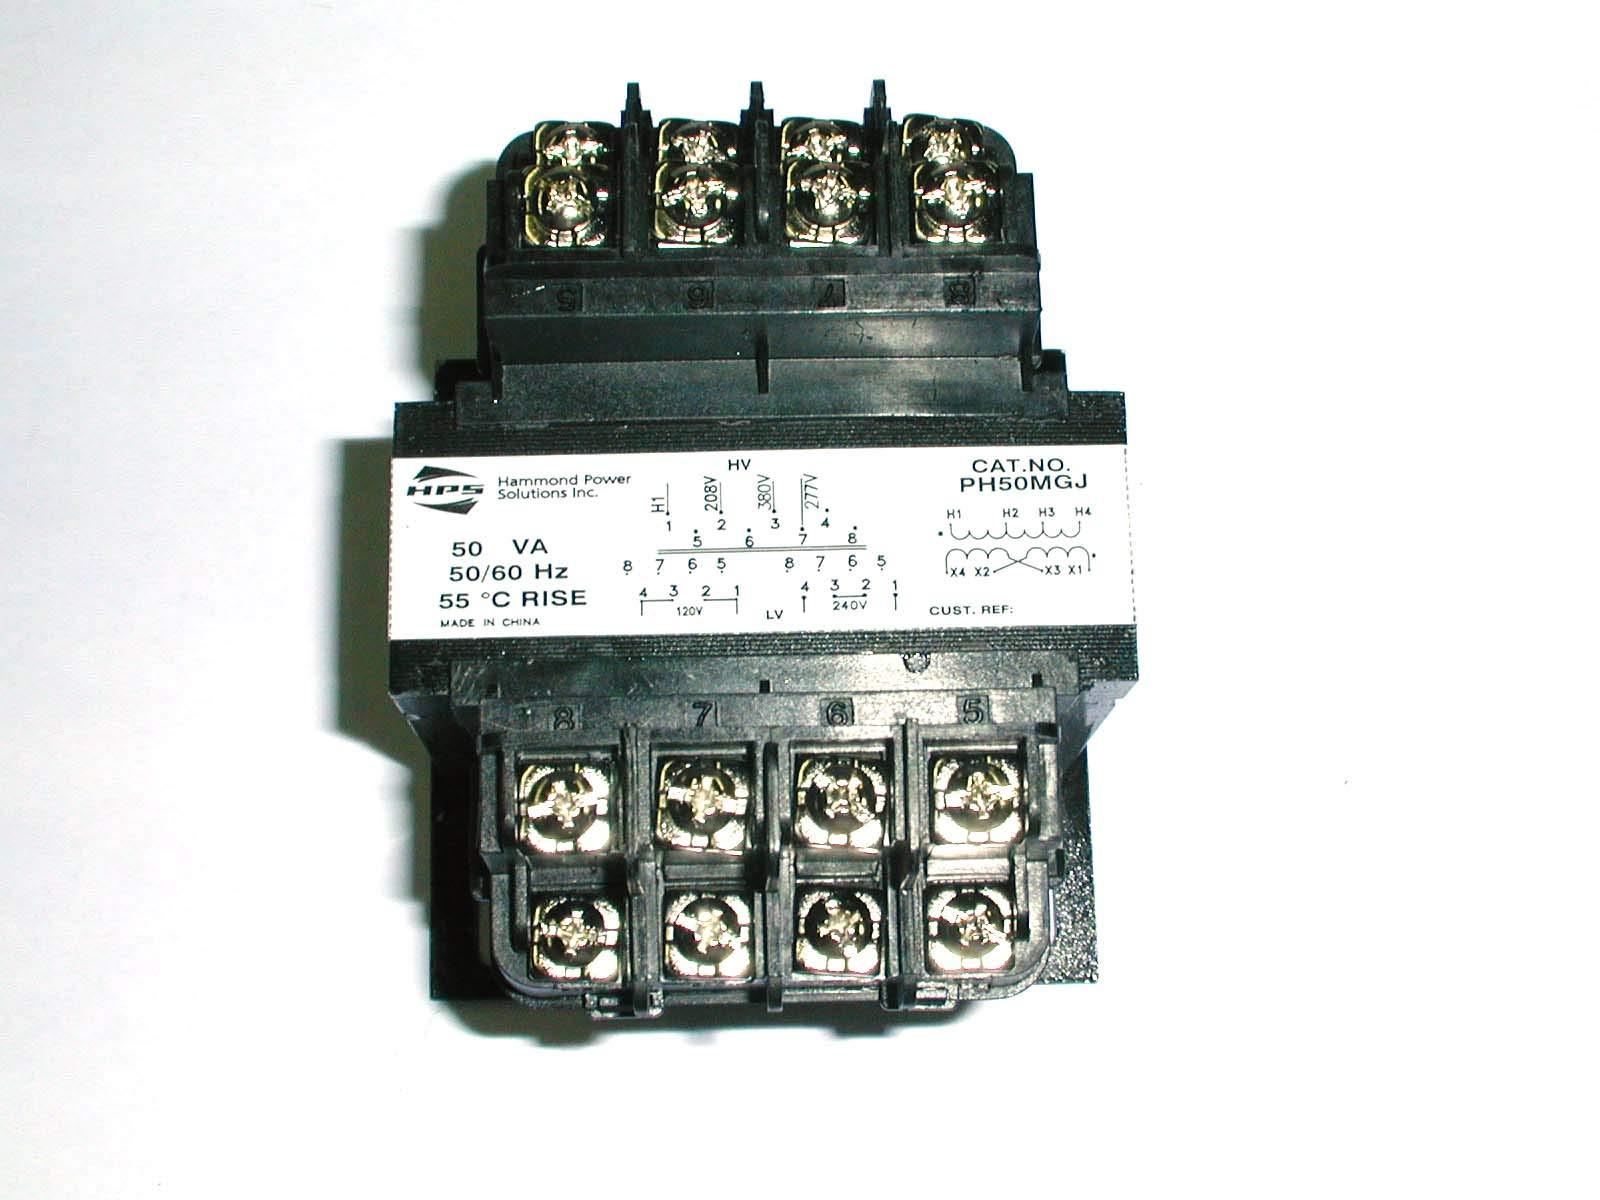 PH50MGJ Transformer, Control, pri: 380/277/208V, 1ph, sec: 50VA, 120/240V.42/.21A